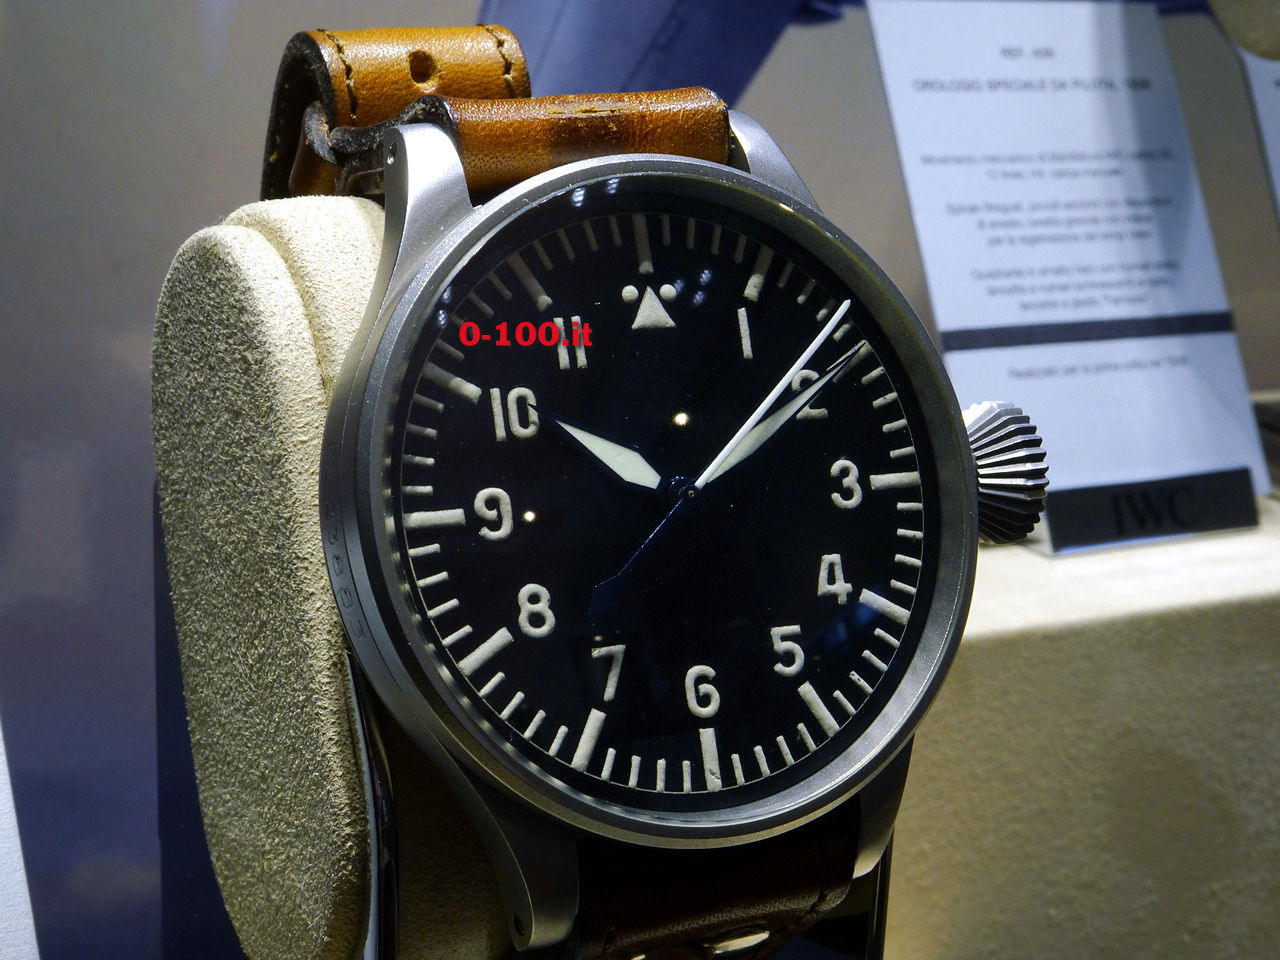 IWC_pilot_heritage-0-100_8